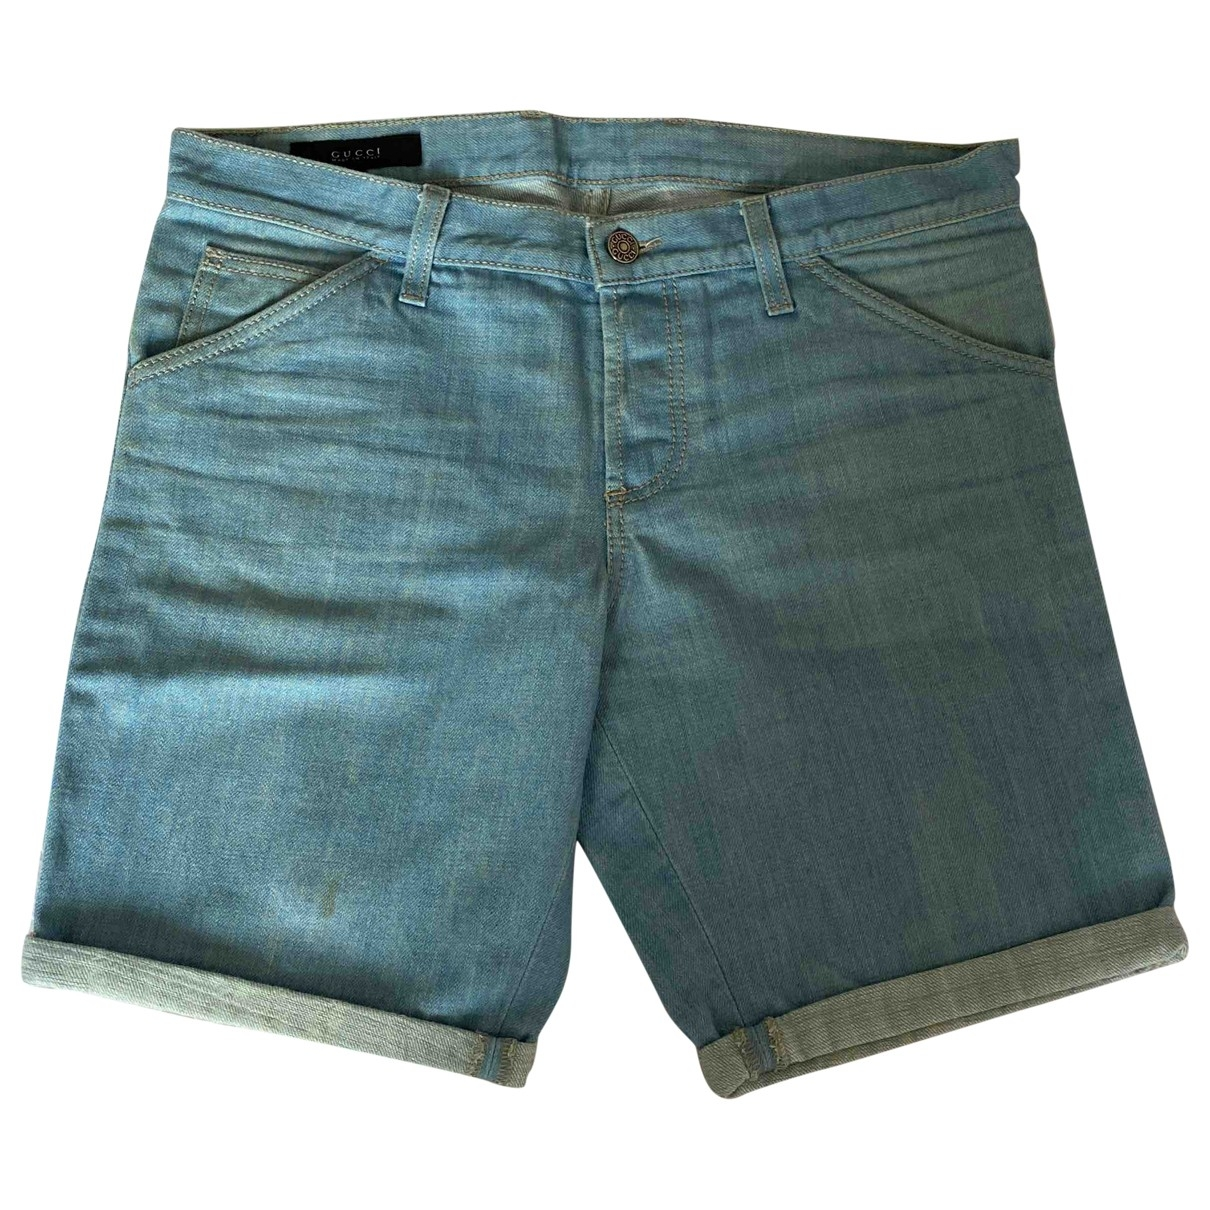 Gucci \N Shorts in  Blau Denim - Jeans